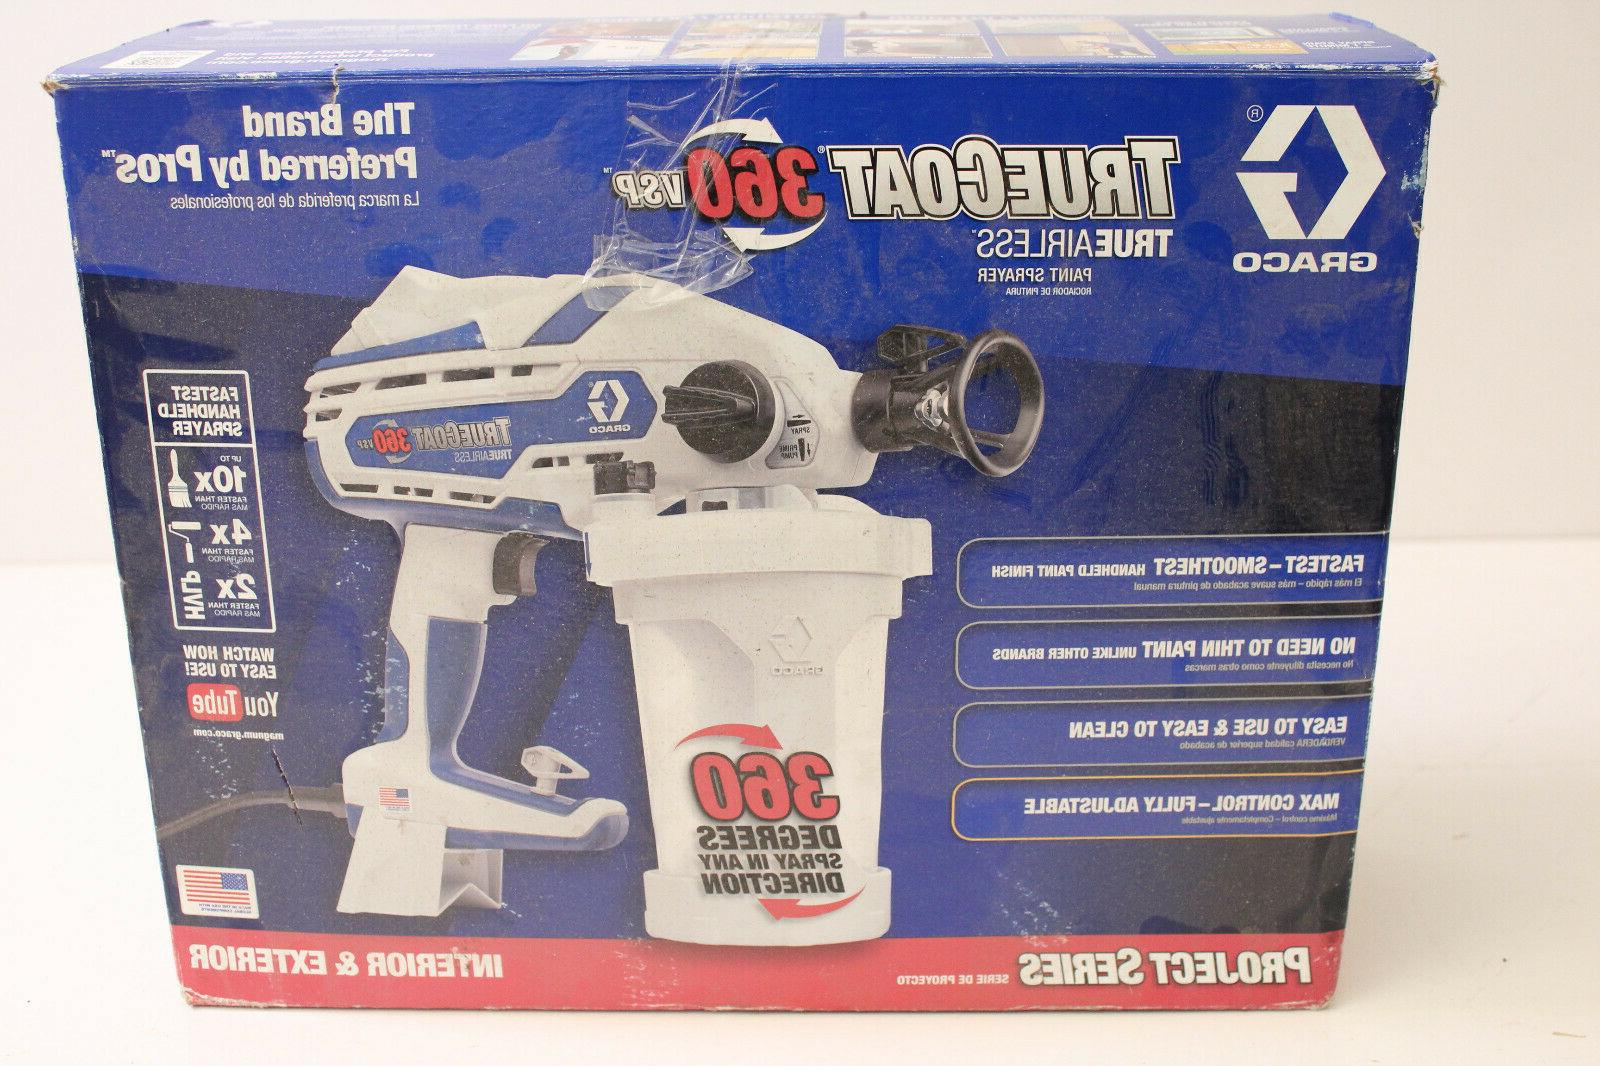 17d889 truecoat 360vsp handheld paint